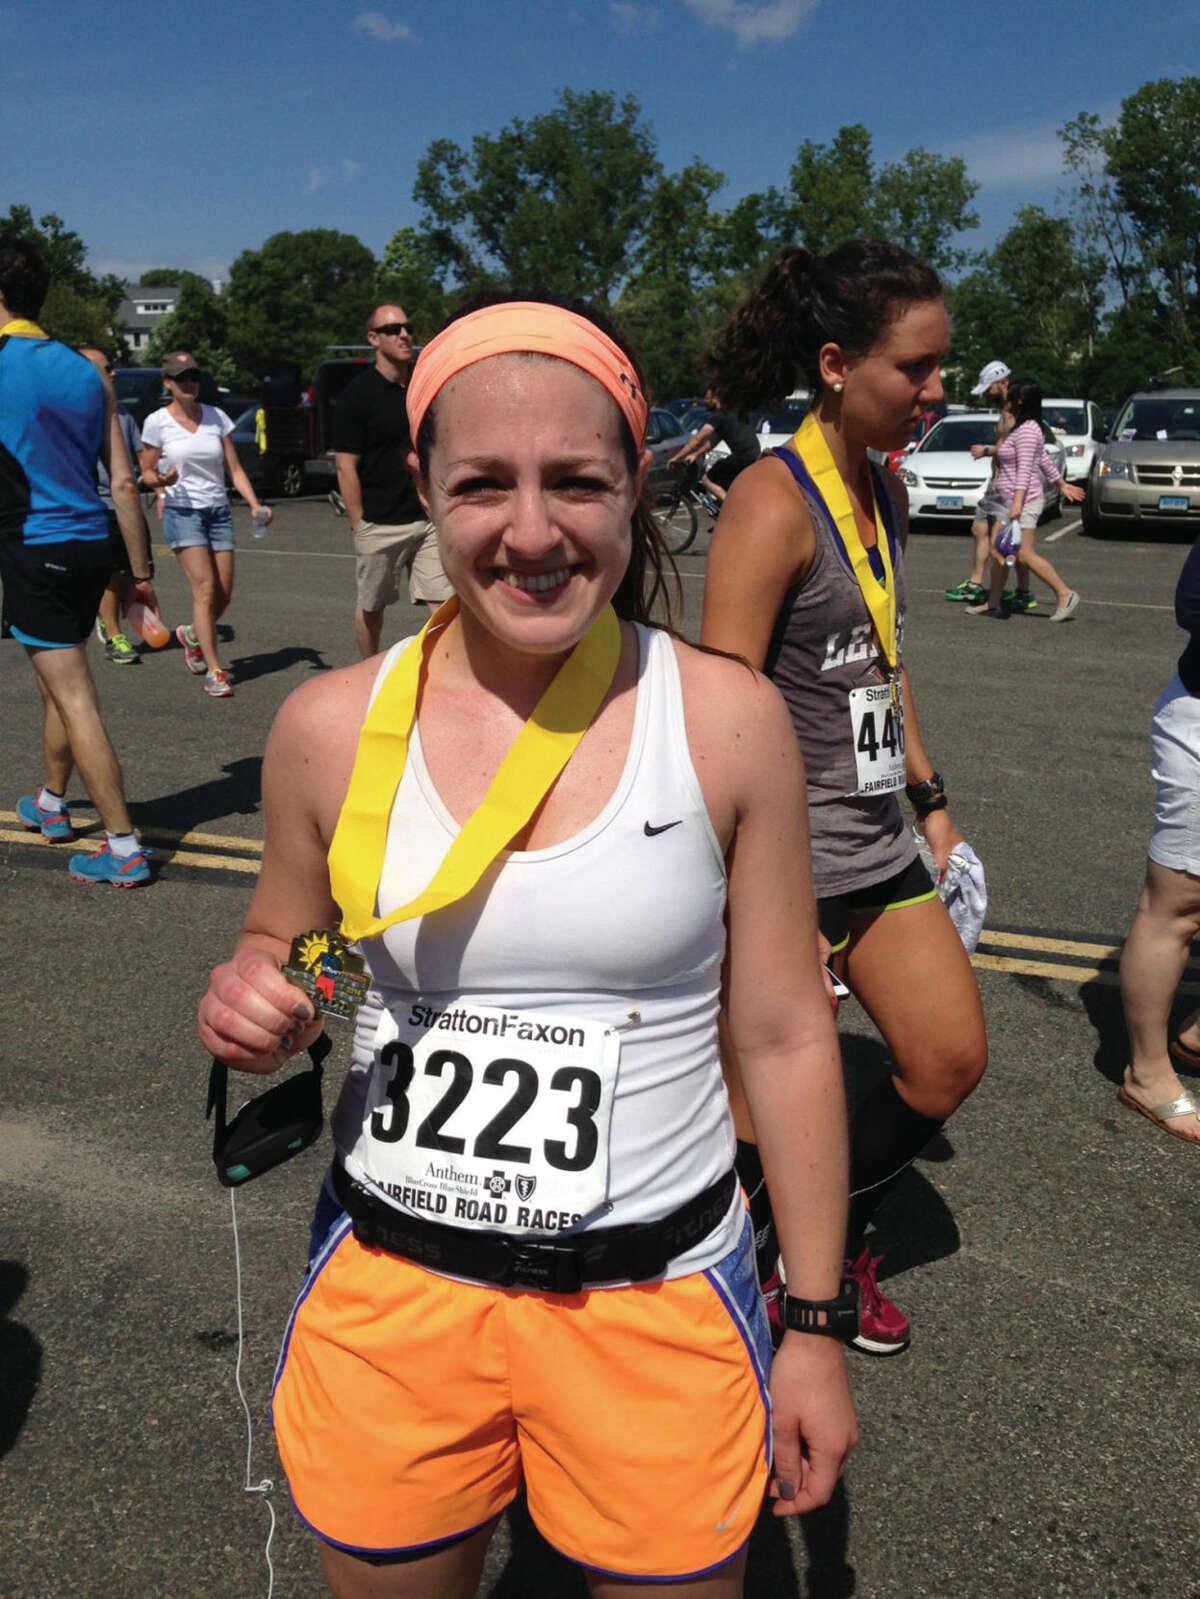 Casey Osgood, a 2010 Wilton High School graduate, plans to run the Boston Marathon to raise money for cancer research.